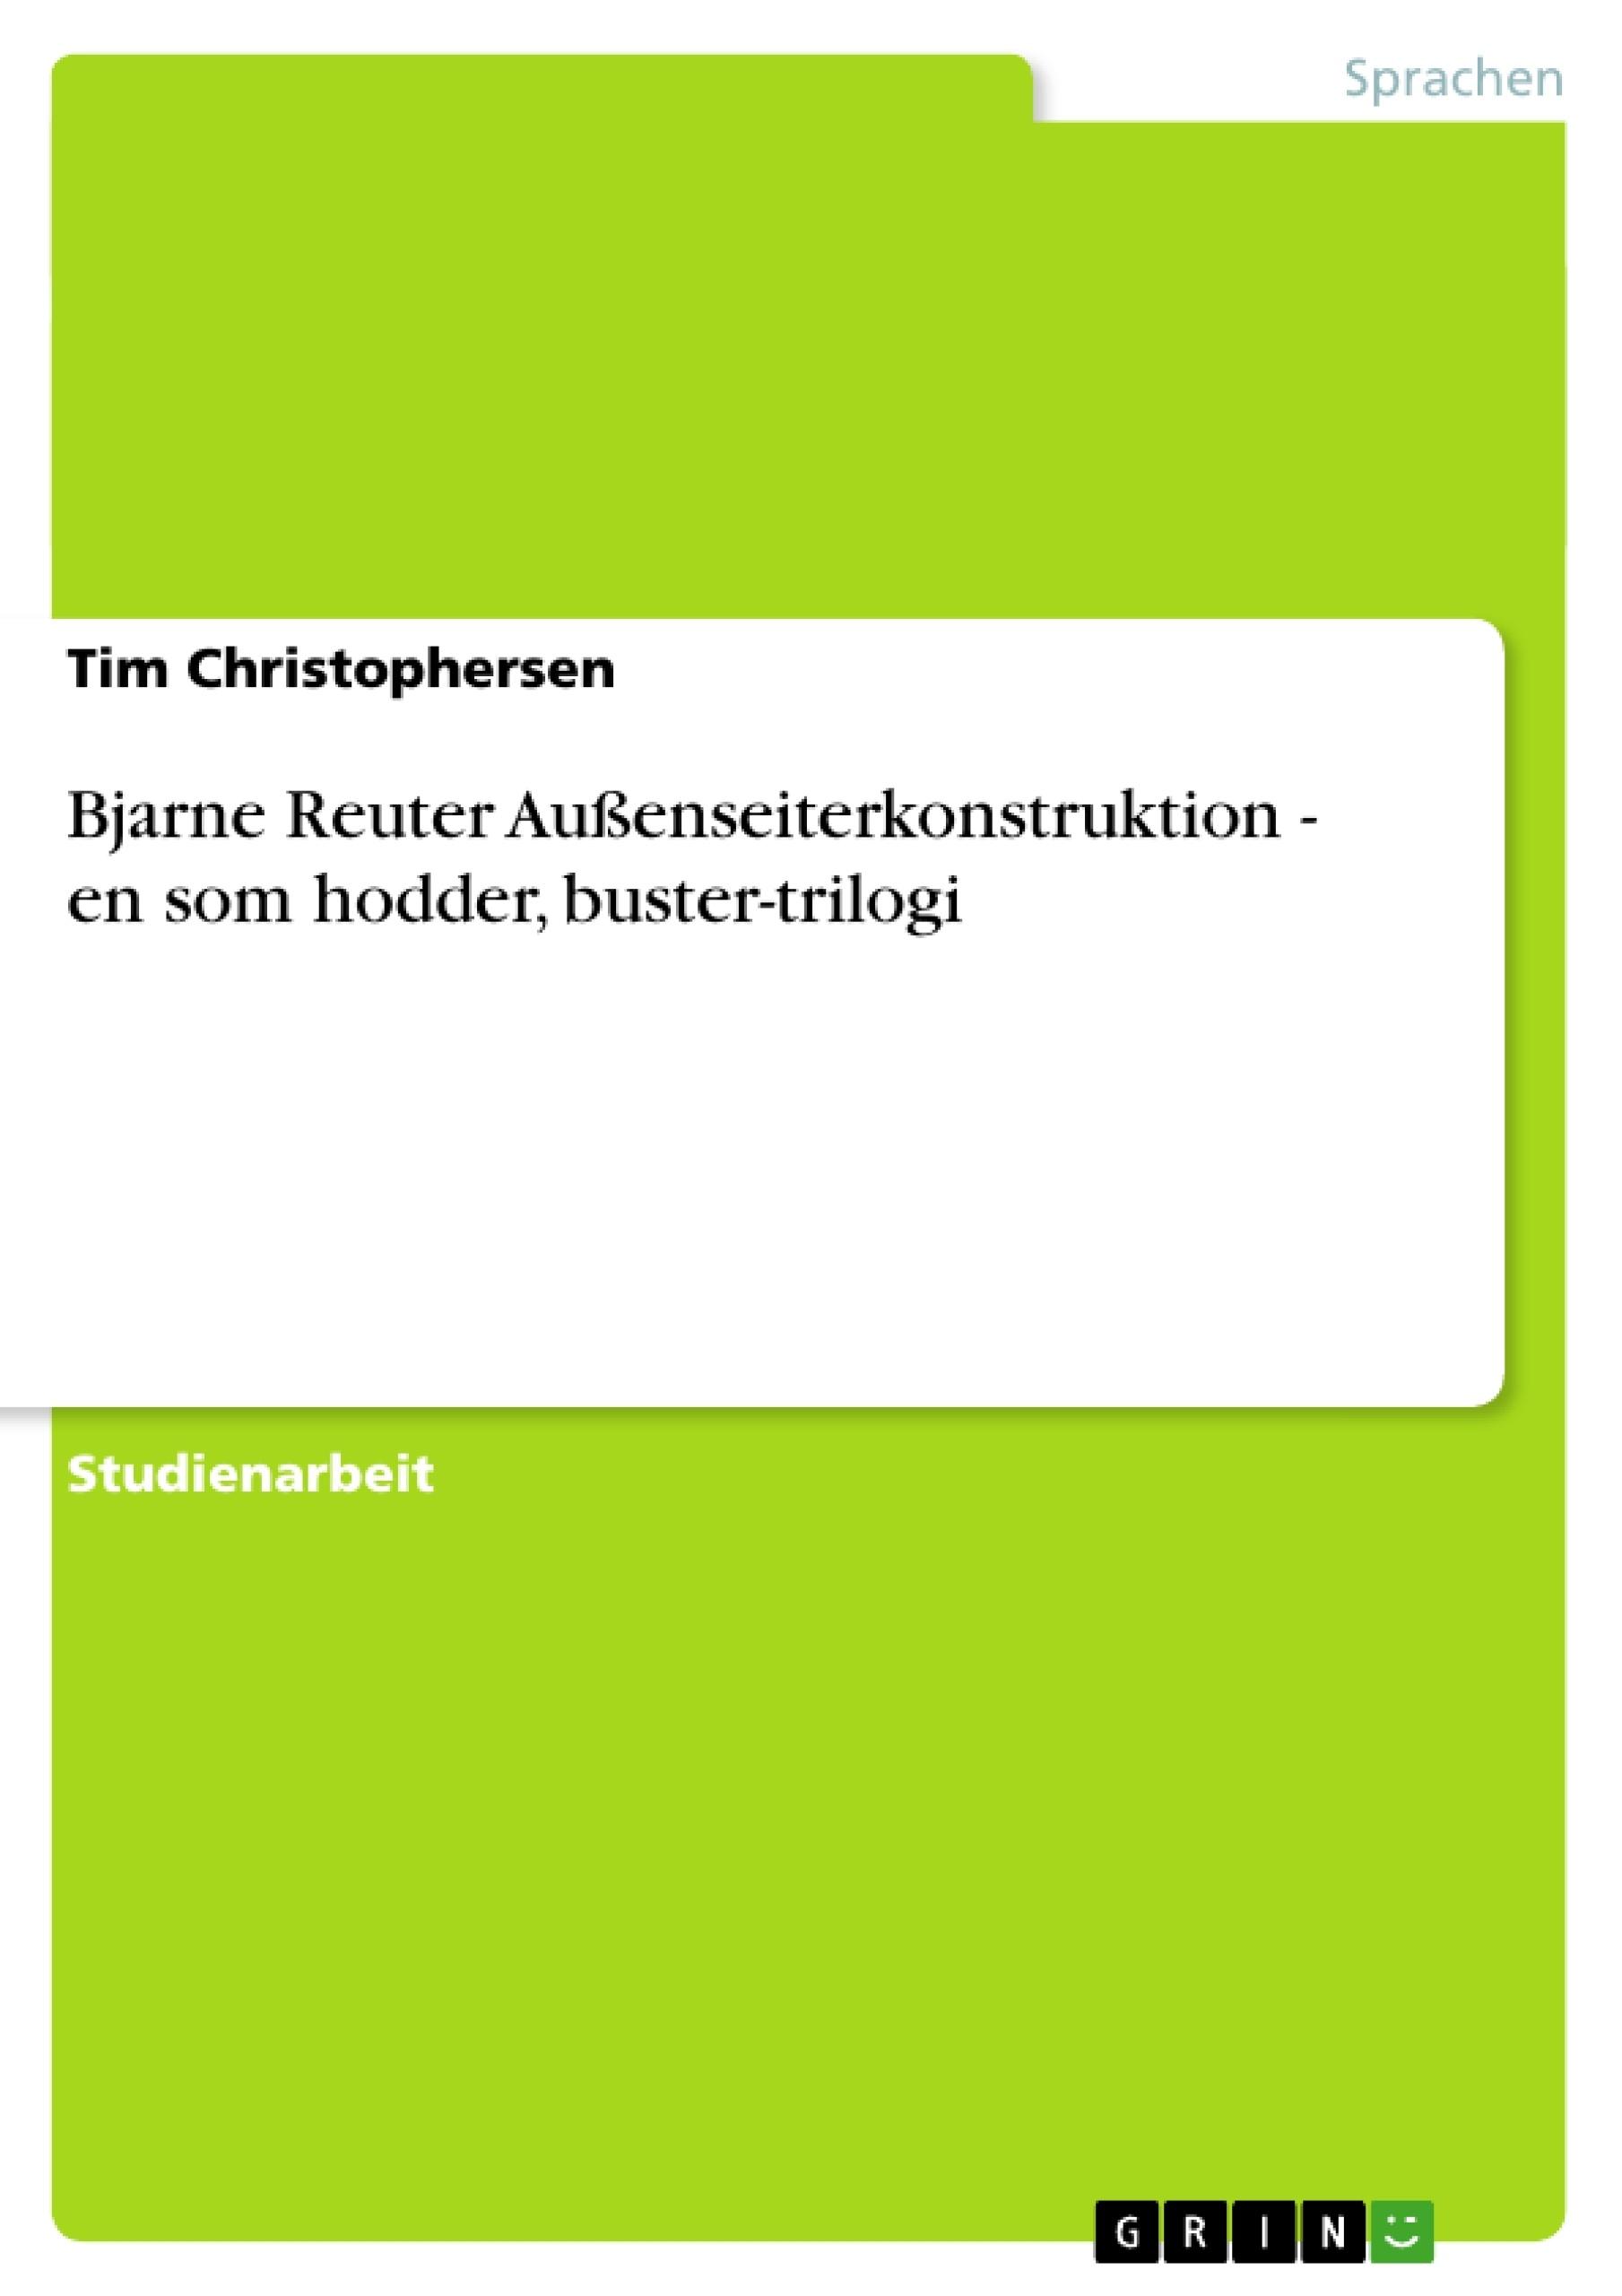 Titel: Bjarne Reuter Außenseiterkonstruktion - en som hodder, buster-trilogi